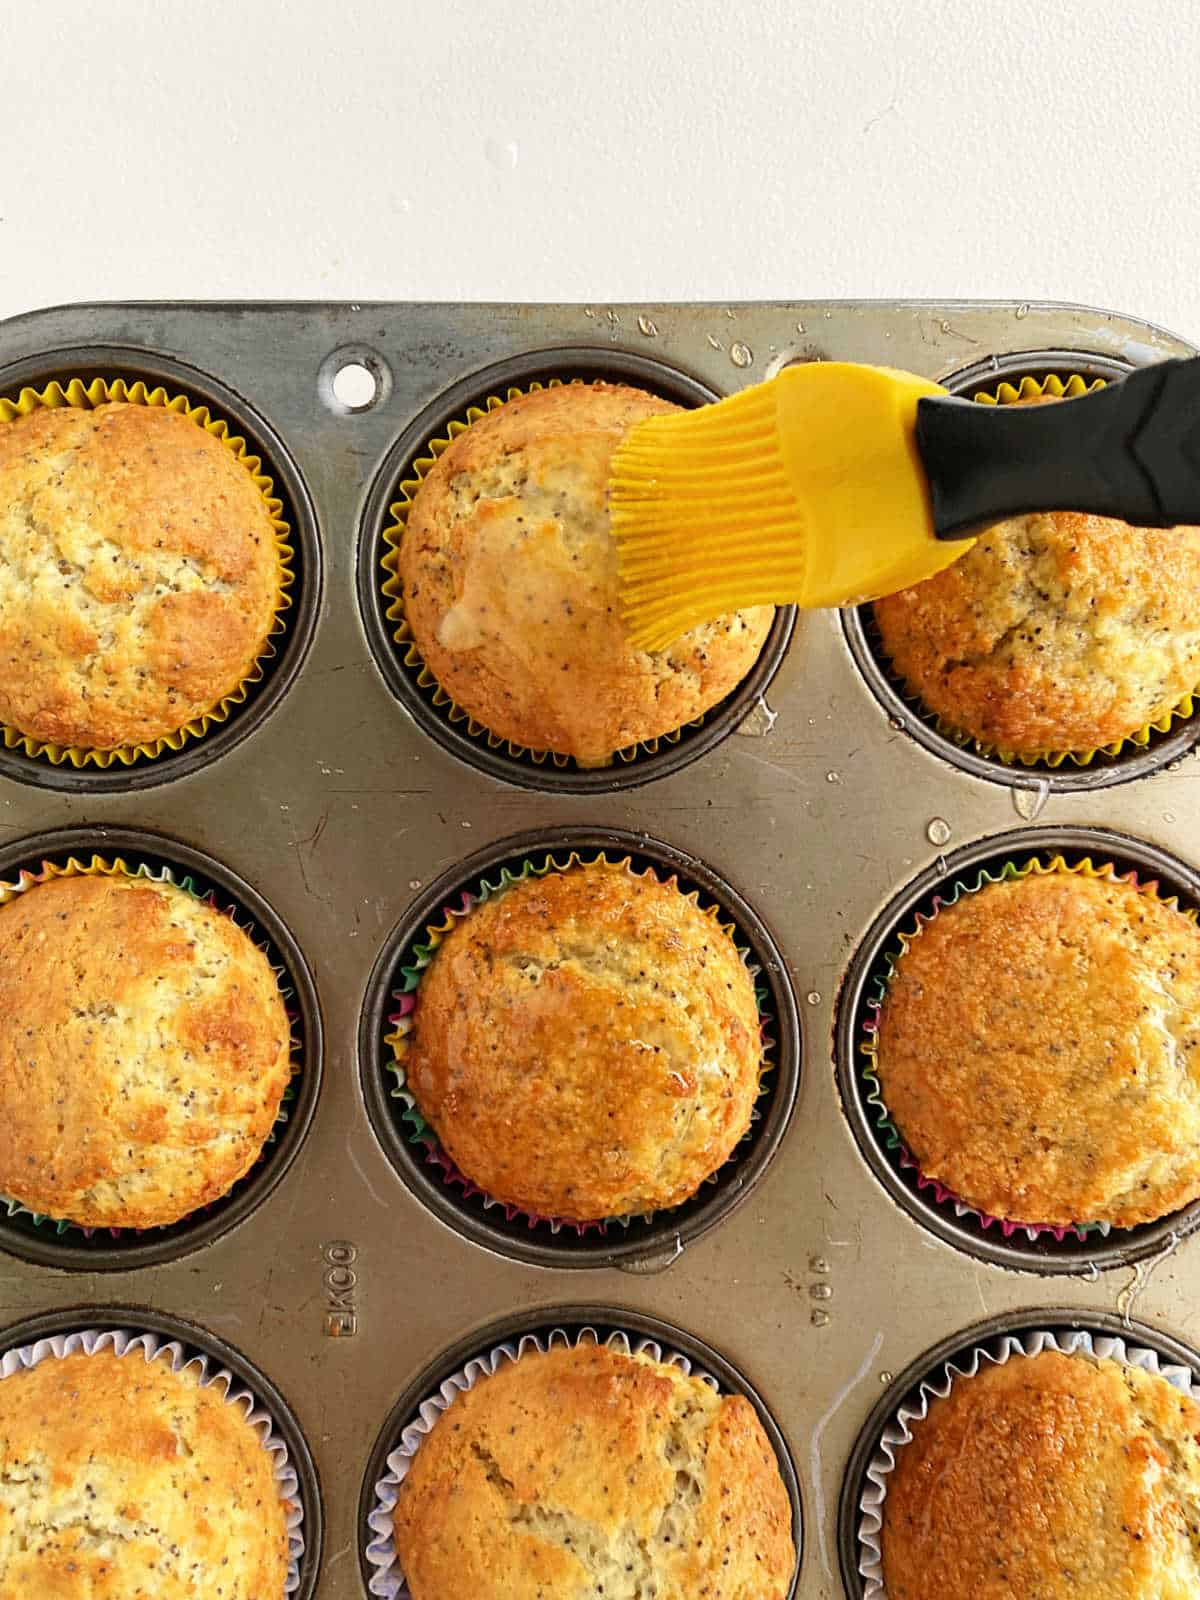 Brushing lemon muffins in metal pan with syrup